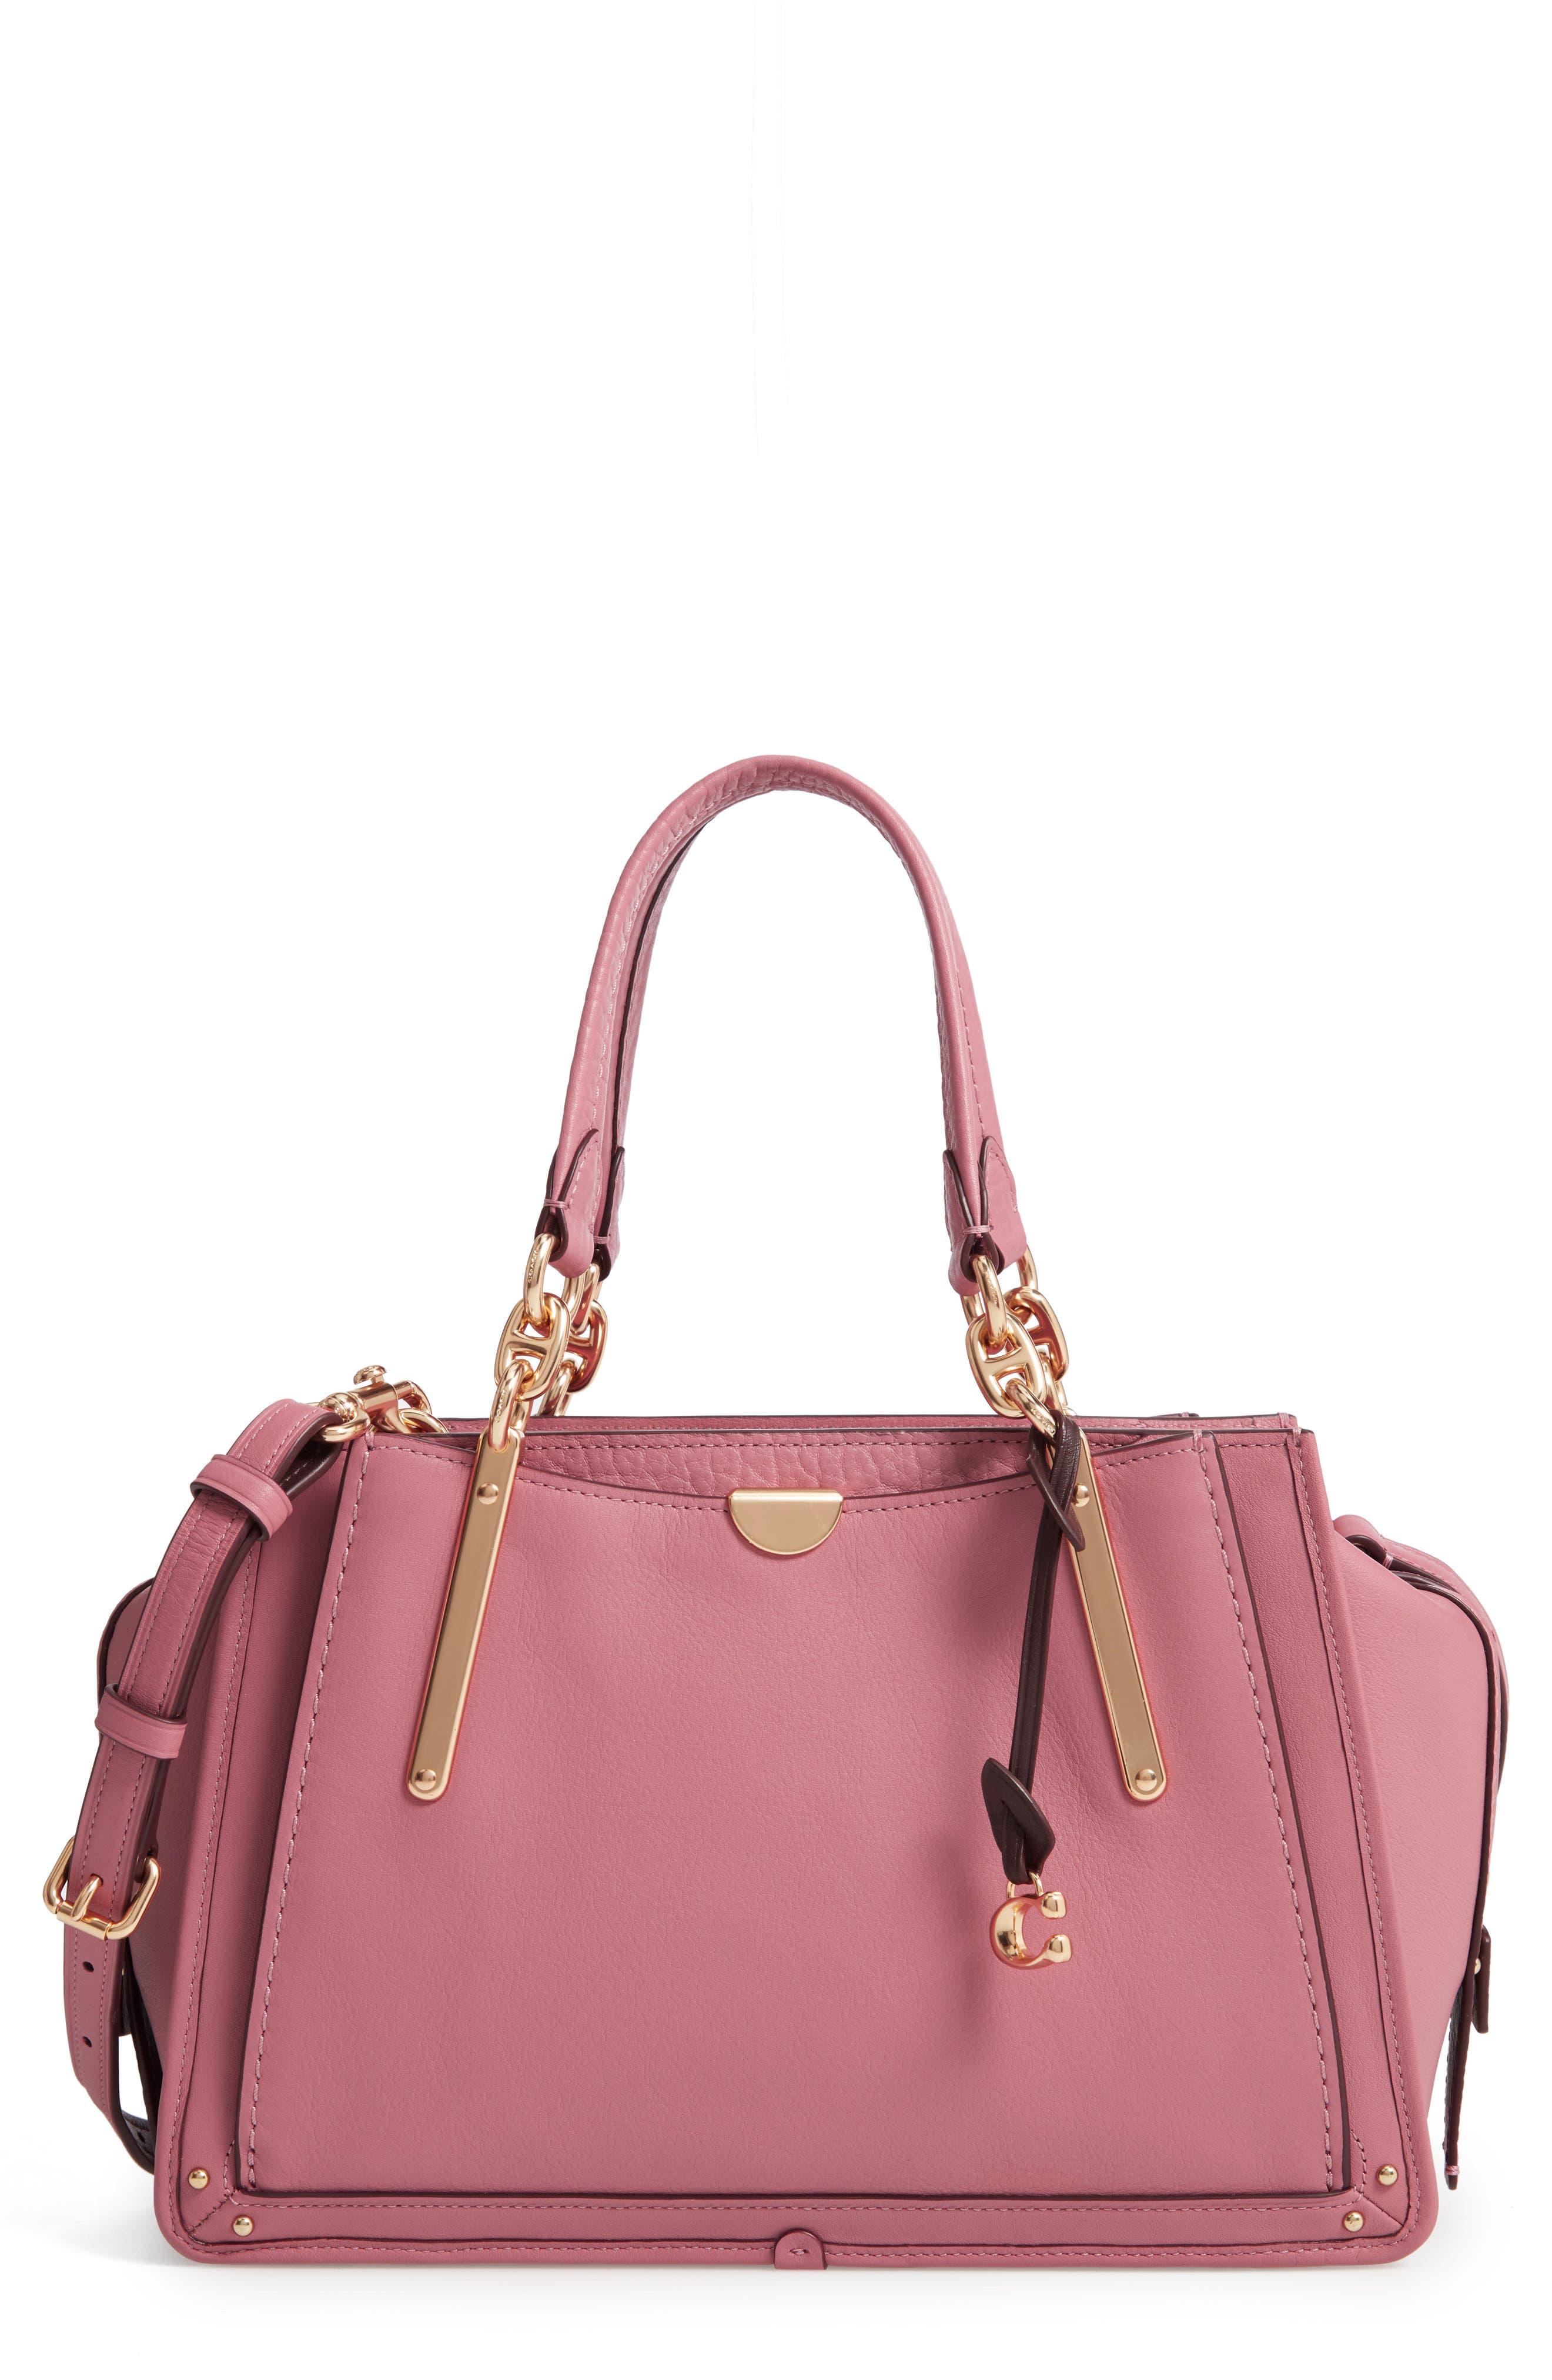 Dreamer Leather Handbag,                         Main,                         color, ROSE MULTI